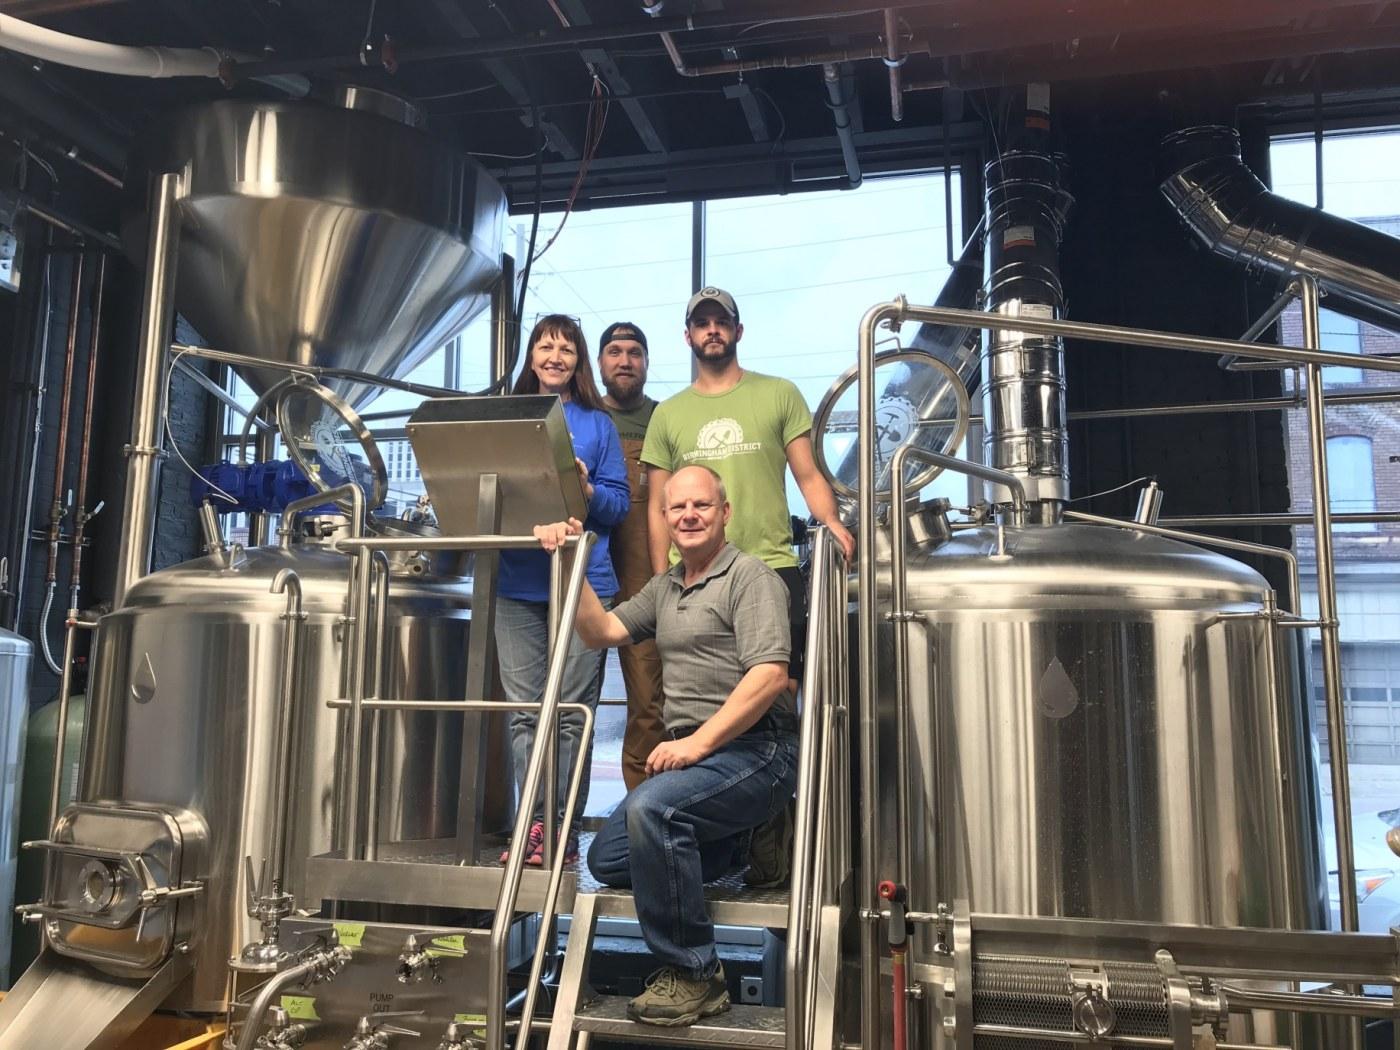 Alabama, Birmingham District Brewing Co. Cheri Kueven, Cale Sellers, James Sumpter, Brad Kueven, The Battery